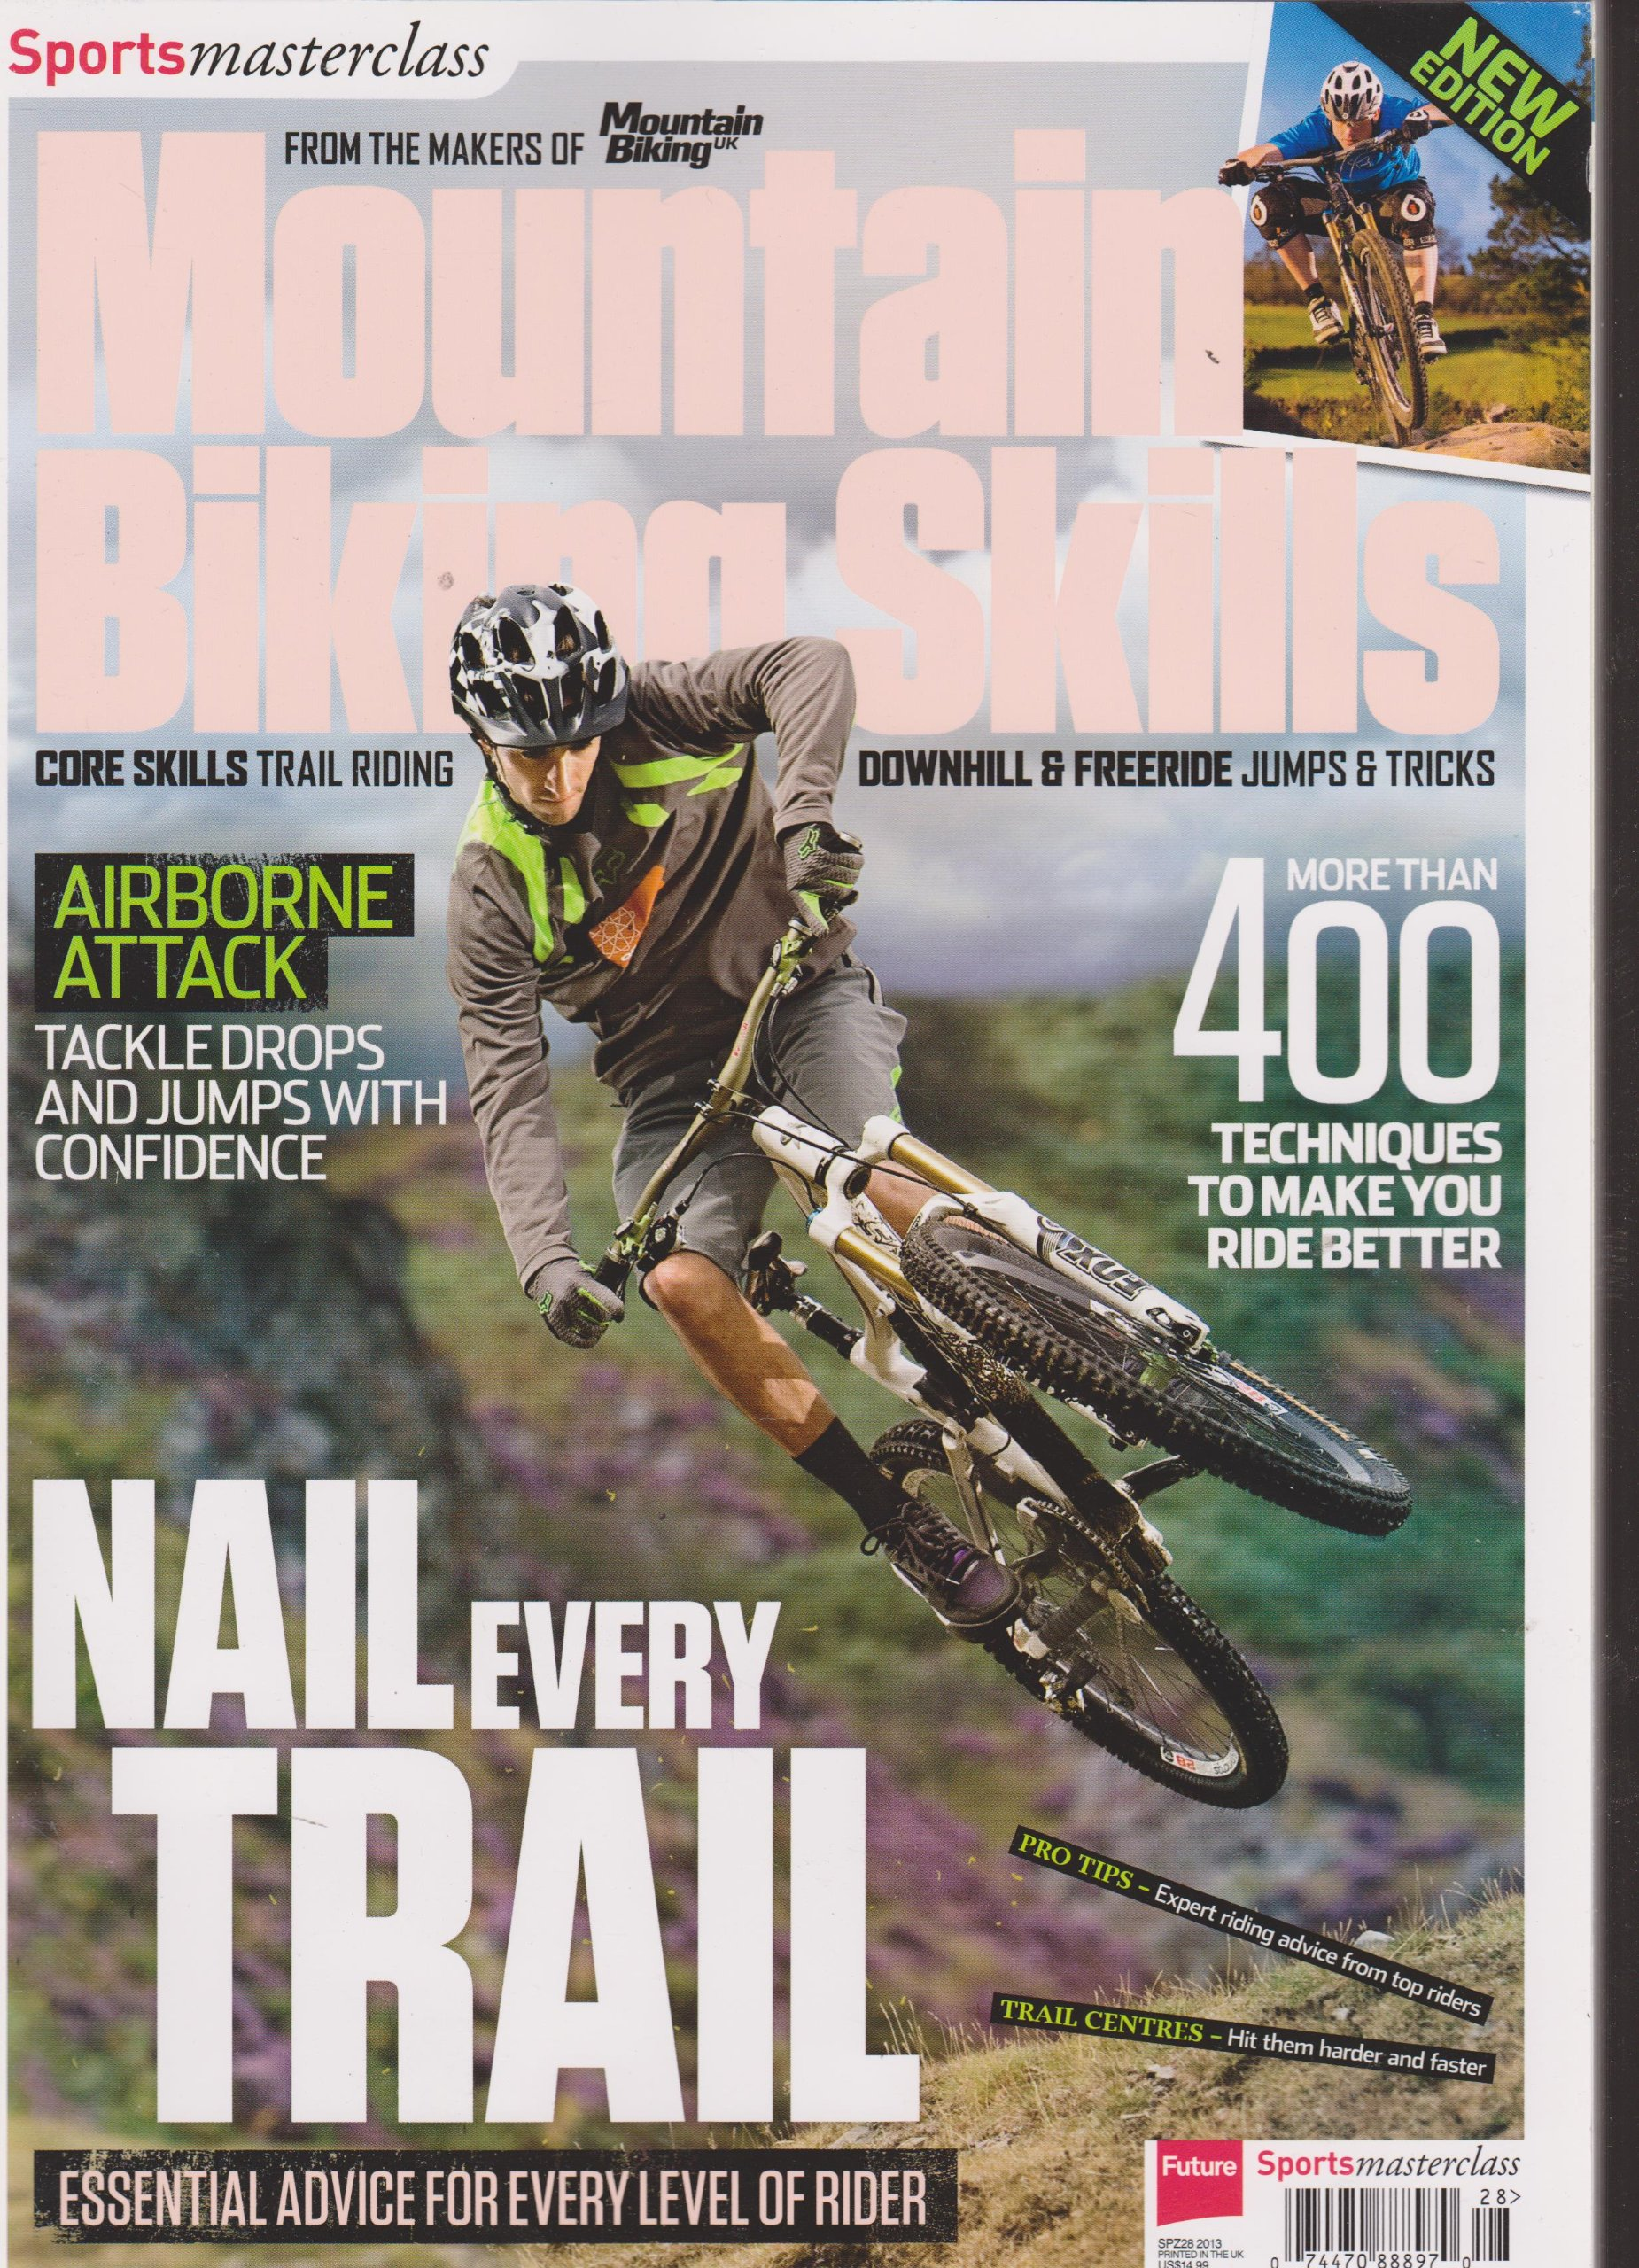 Sports Masterclass Mountain Biking Skills Magazine 2013 PDF